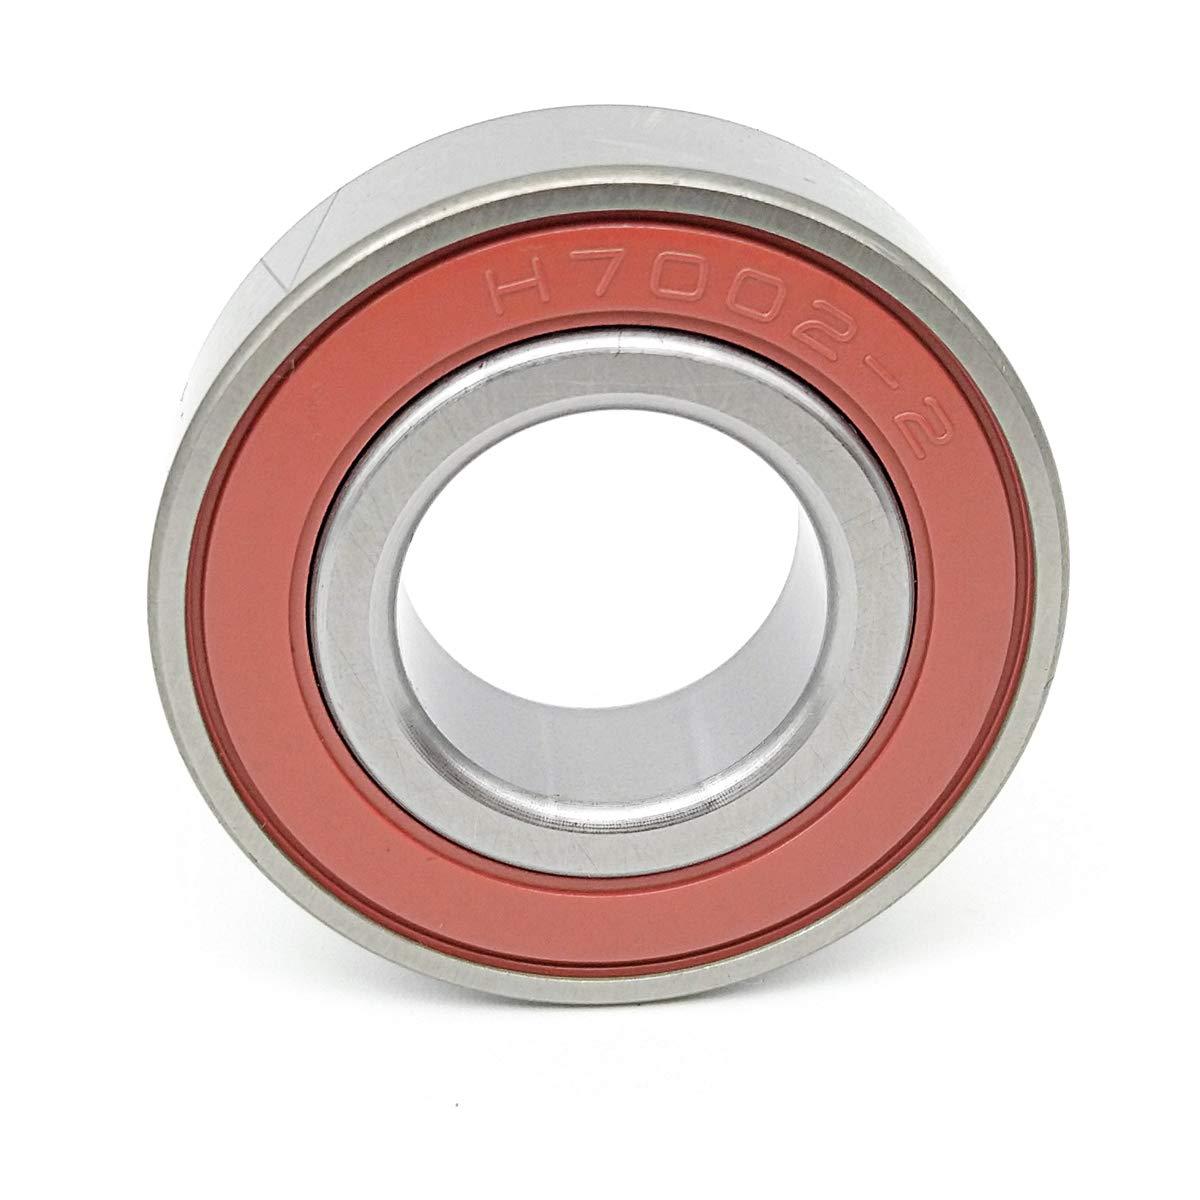 MOCHU Bearings 7002 H7002C-2RZ-P4 15x32x9 Sealed Angular Contact Bearings Speed Spindle Bearings CNC ABEC-7 Metric 15mm ID 9mm Width 32mm OD Machine Tool Spindle Engraving Machine